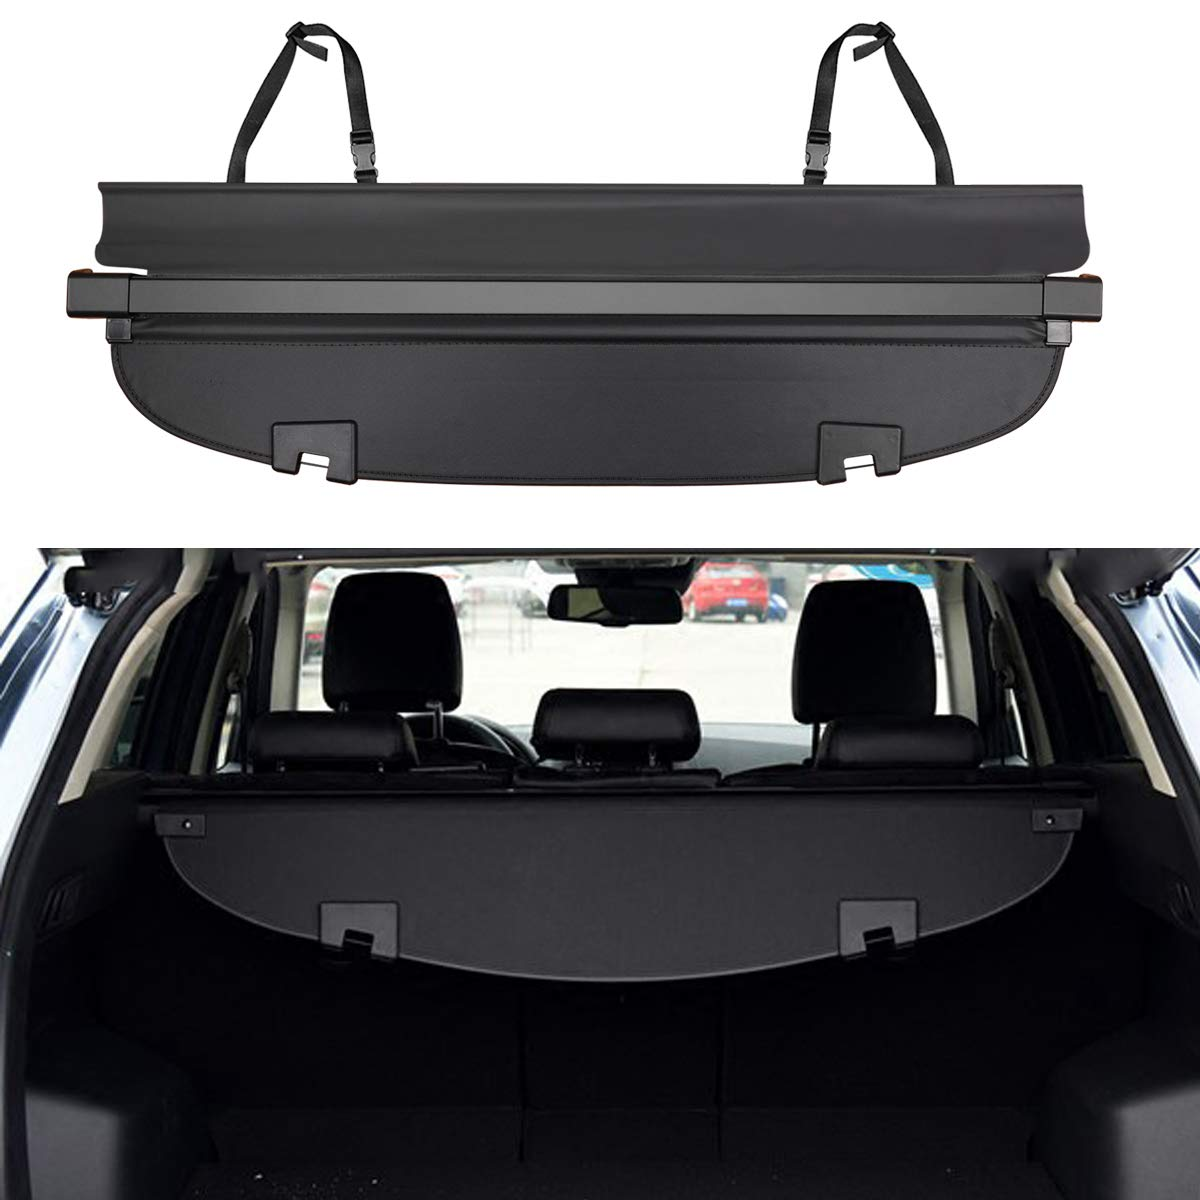 All Weather Odorless Black E-cowlboy Trunk Cargo Liner Mat Tray for Honda HRV HR-V 2014~2020 Heavy Duty Waterproof Rubber Custom Fit